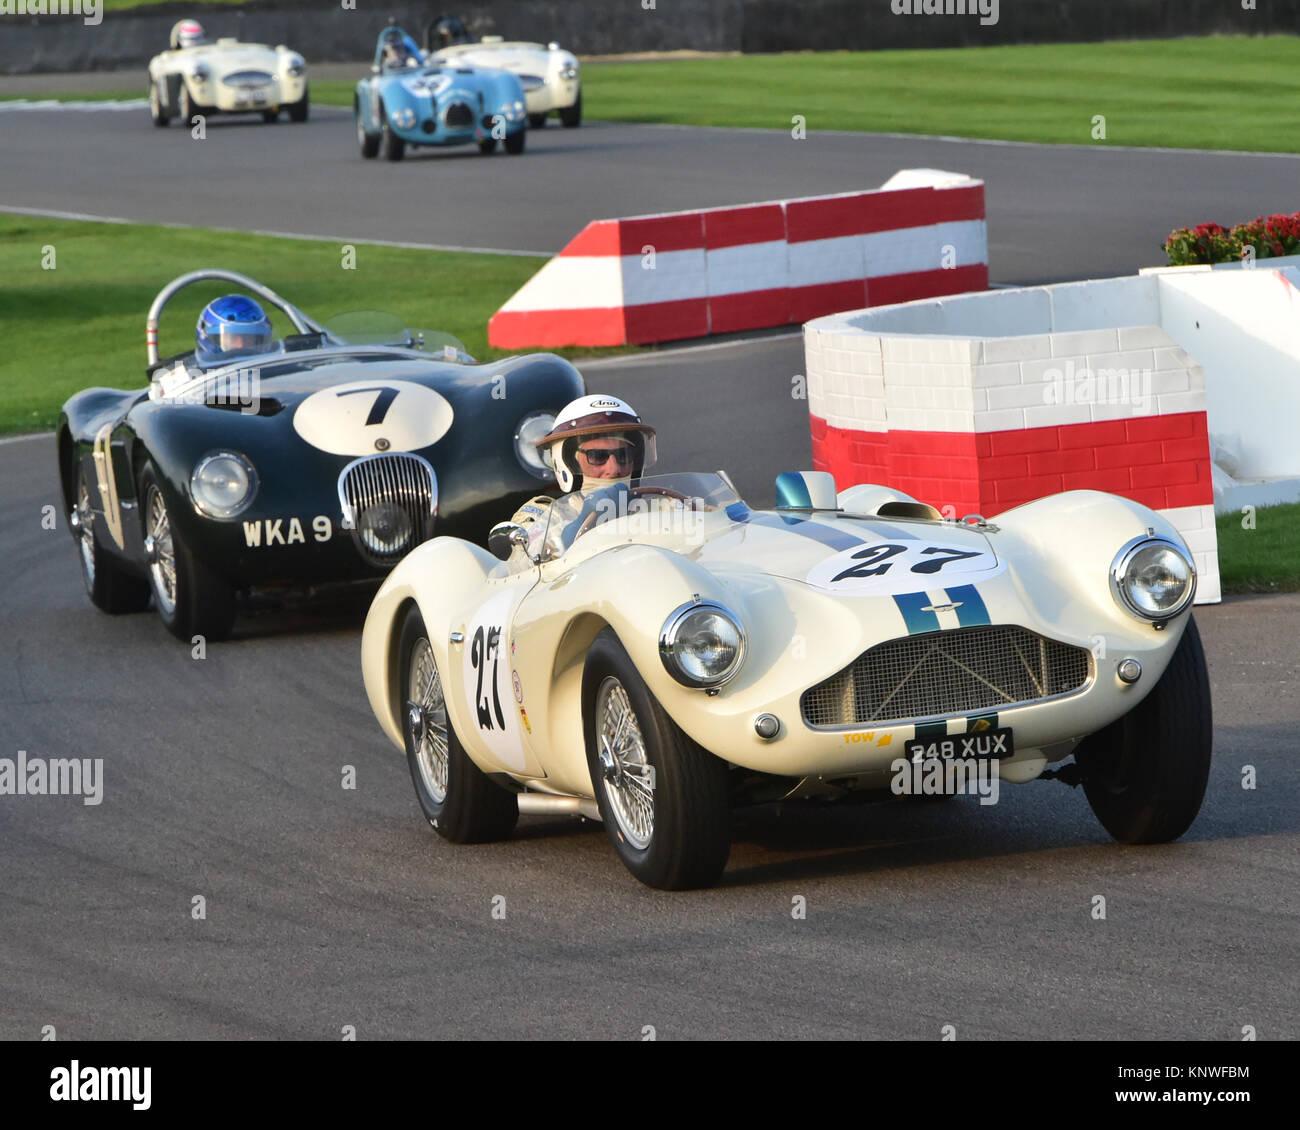 David Bennett, Aston Martin DB 3 S, 248 XUX, Freddie März Memorial Trophy, Goodwood Revival 2014, Goodwood Stockbild